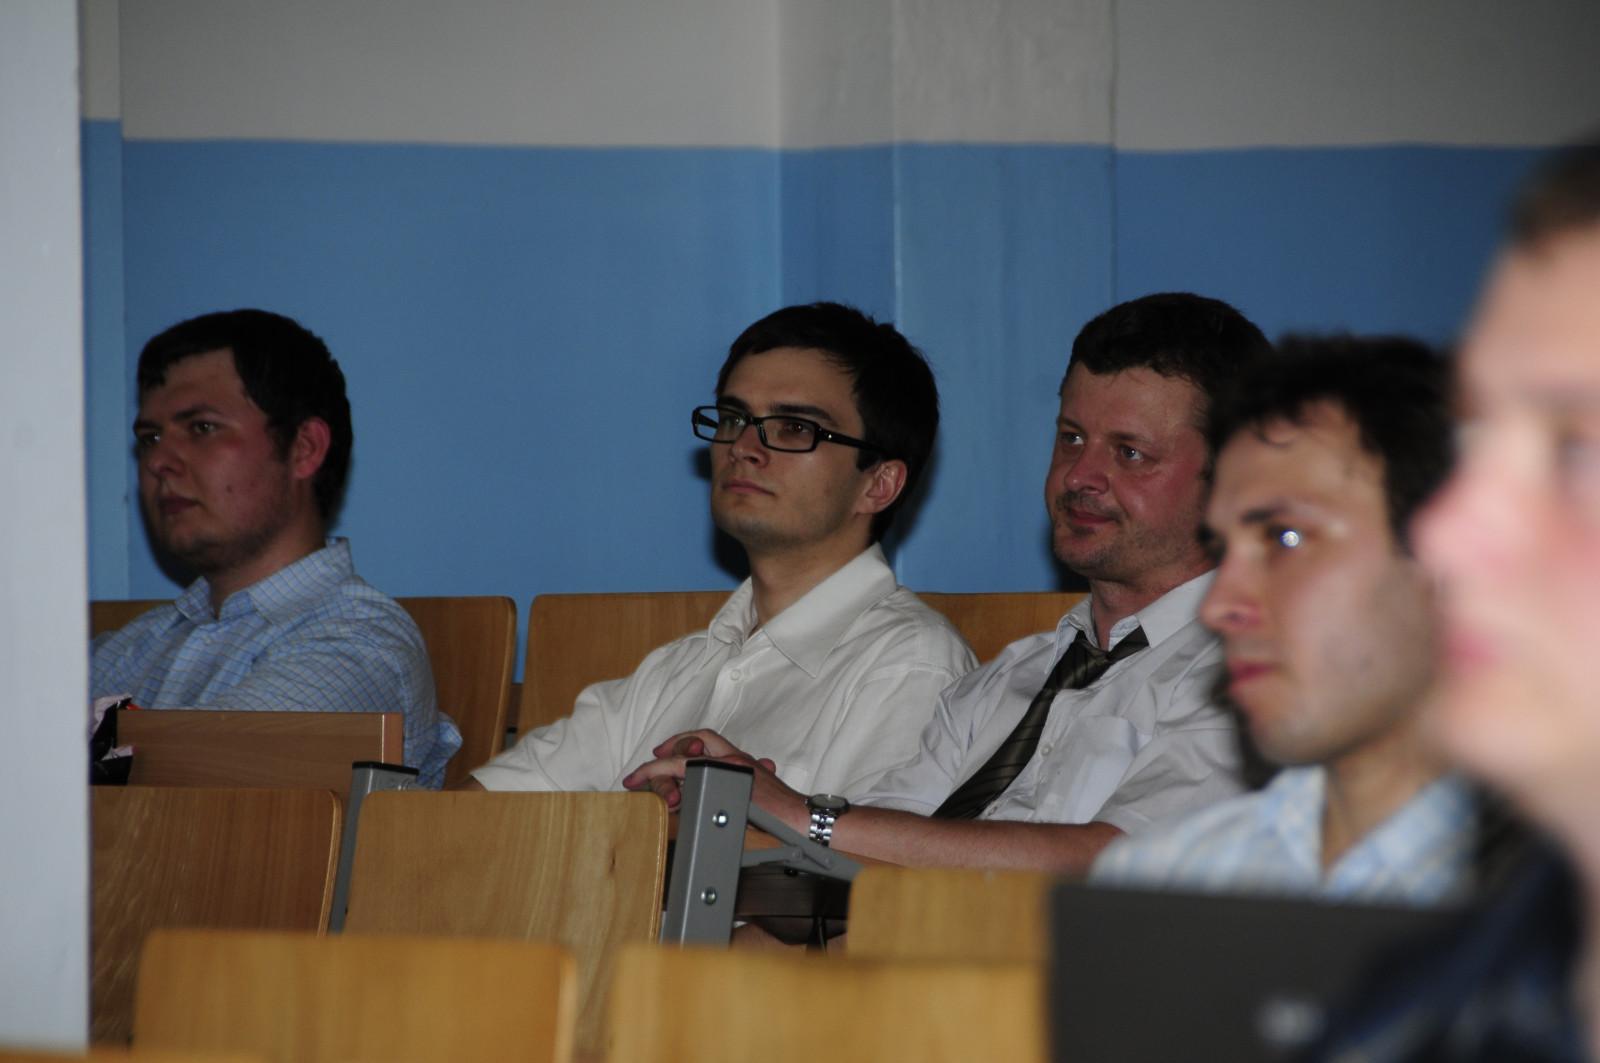 Wieczór z Open Source 2010